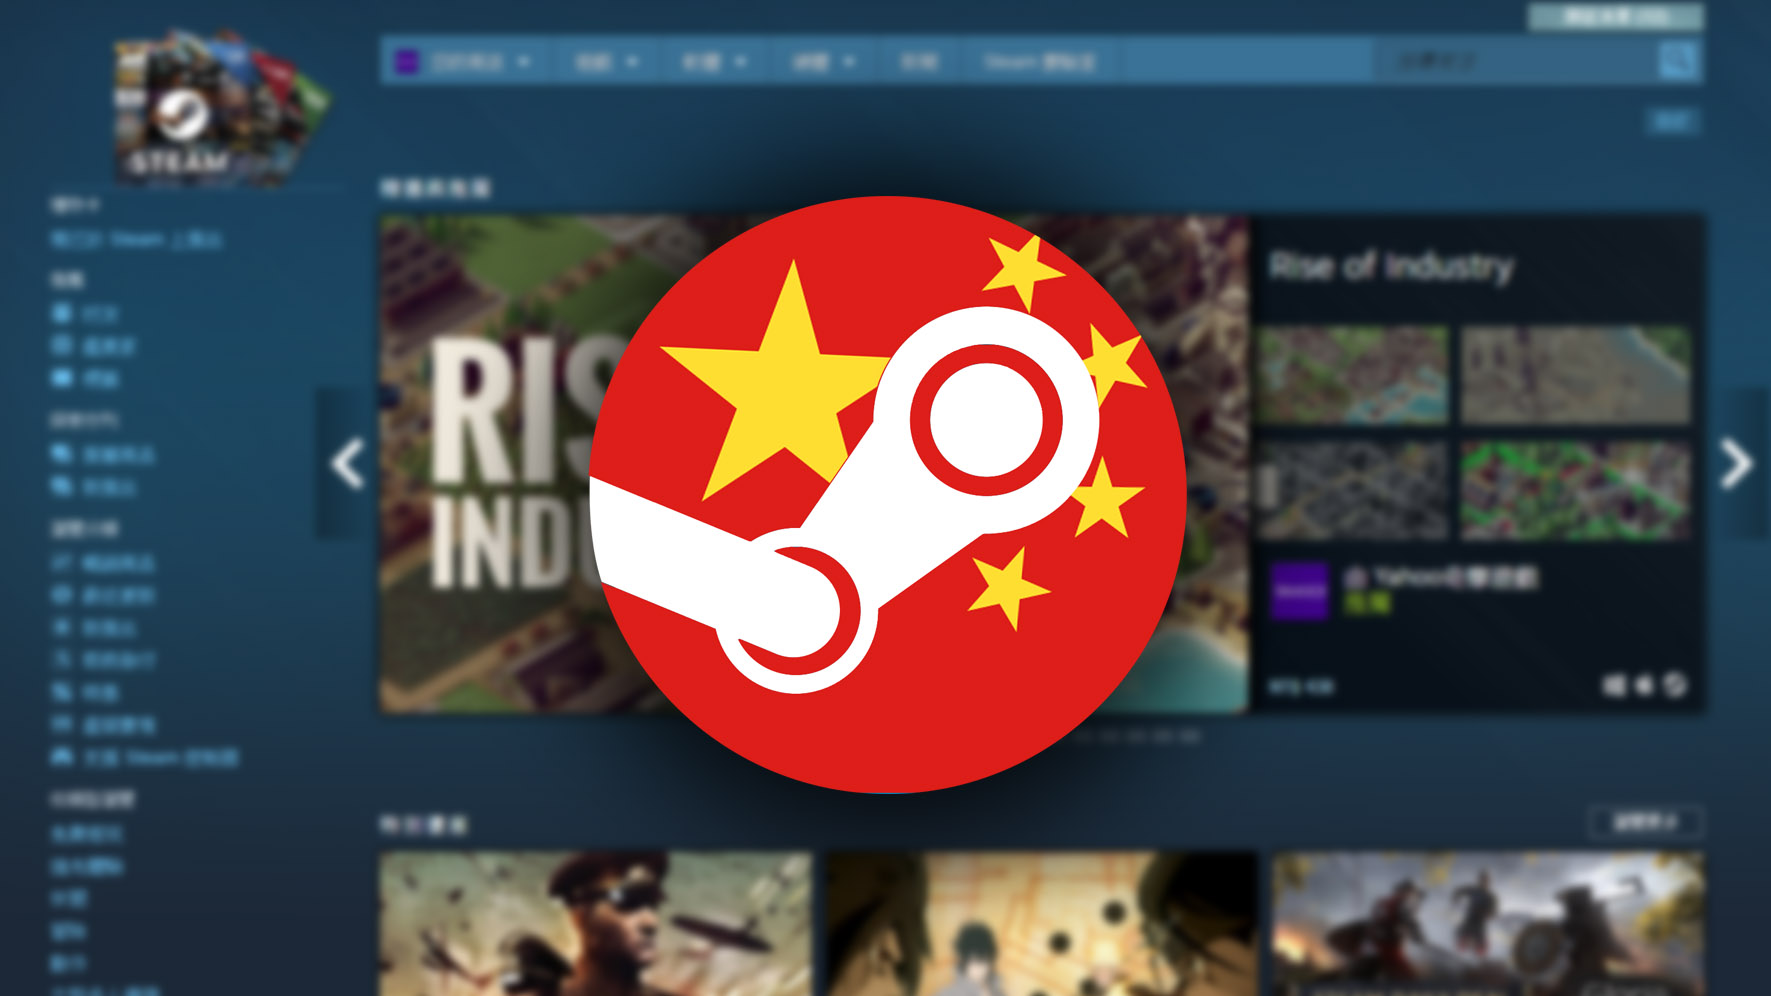 Steam中國或許只是為了給當地政府看的也說不定。(圖源:Steam)